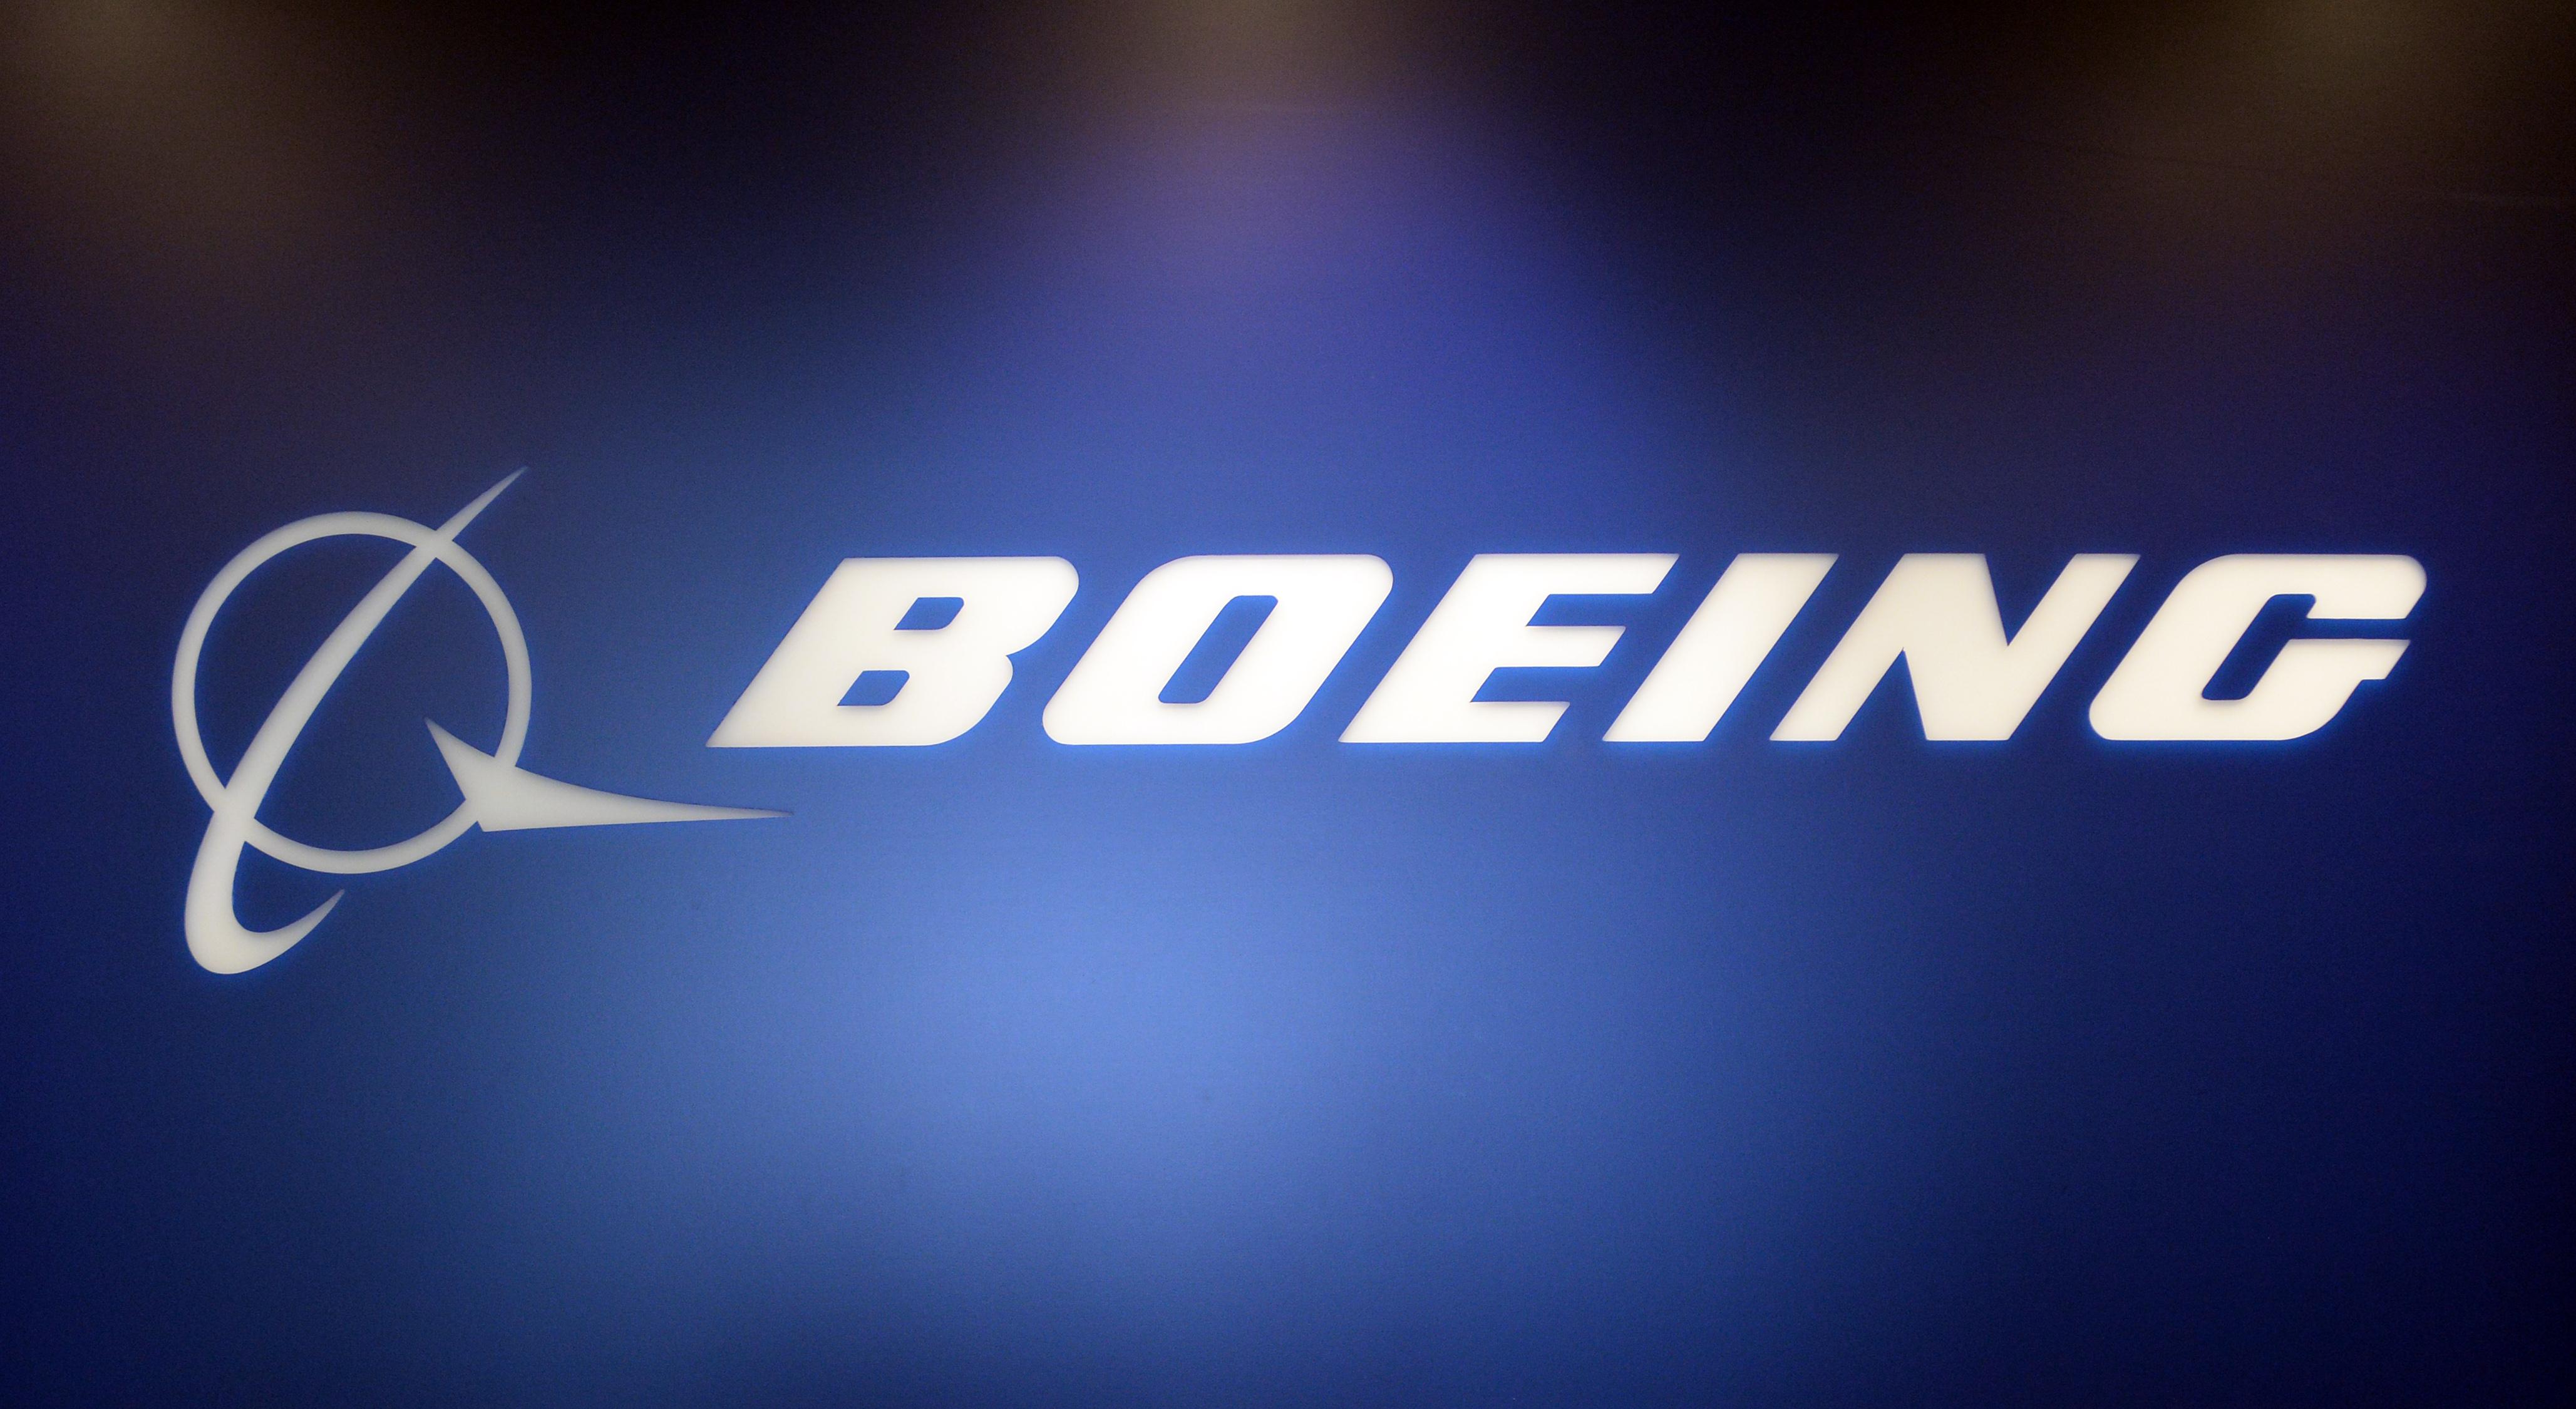 Download Boeing Logo PNG - 38805